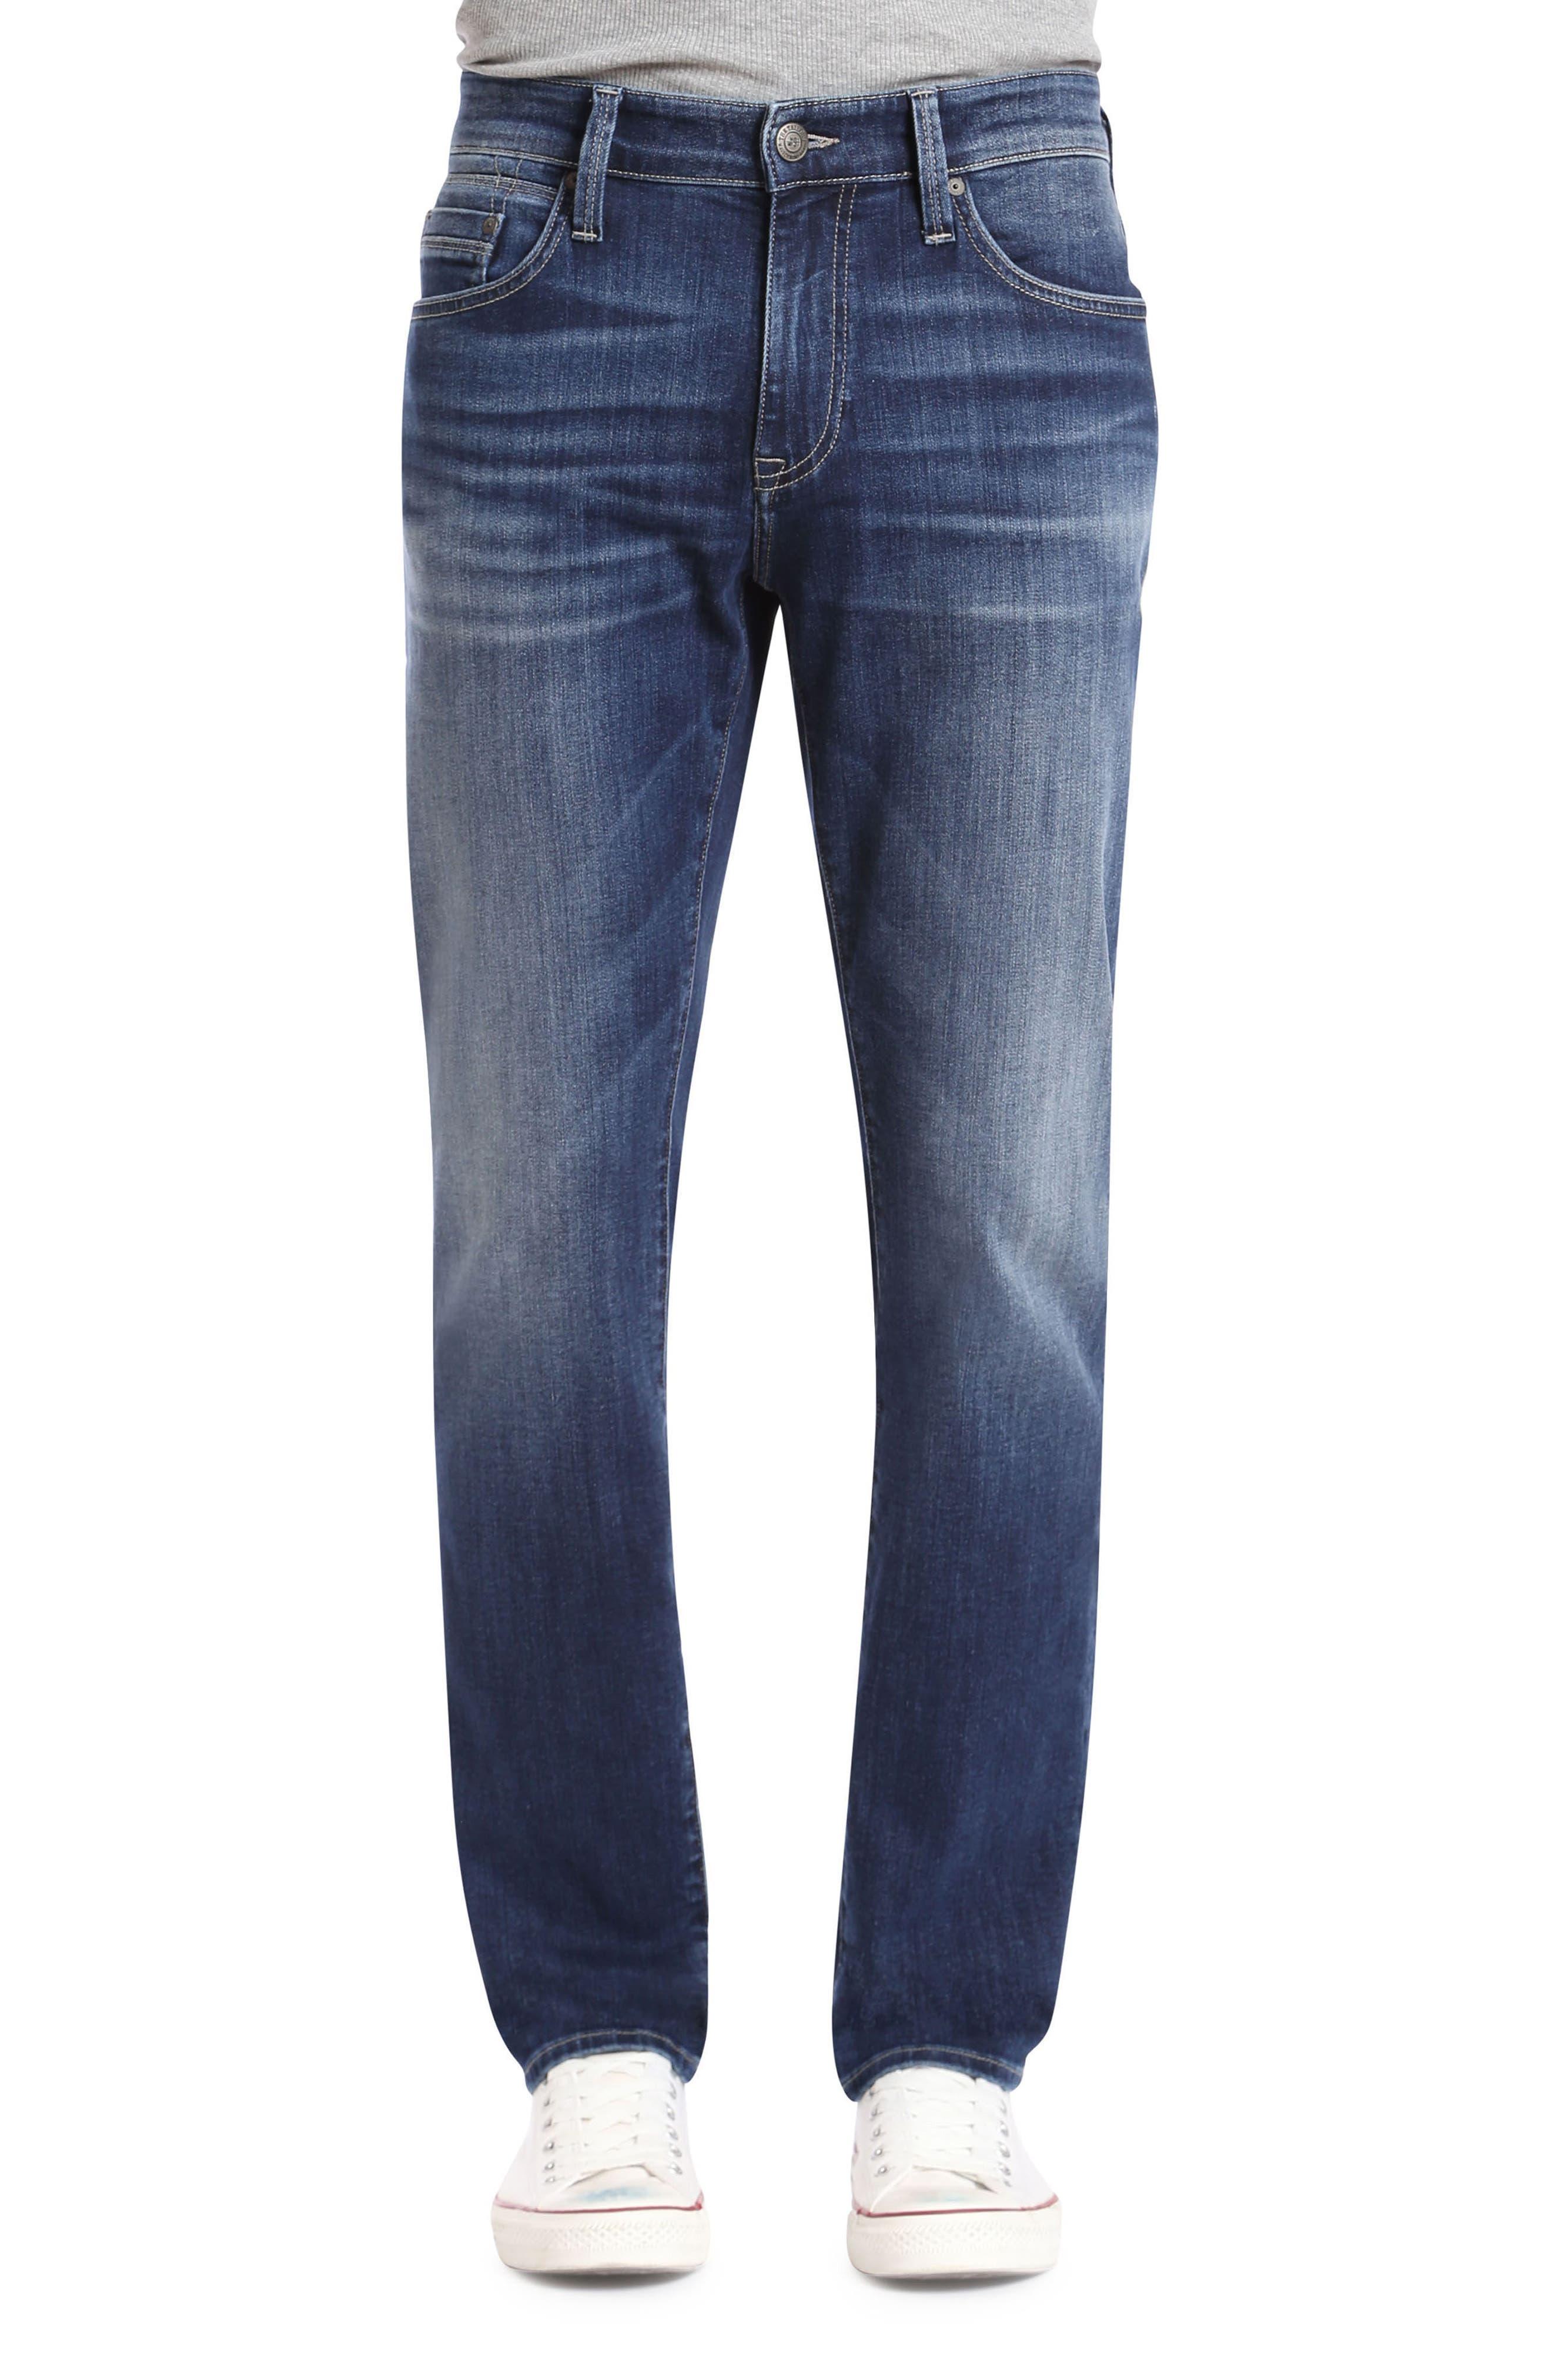 Main Image - Mavi Jeans Marcus Slim Straight Leg Jeans (Dark Blue Williamsburg)